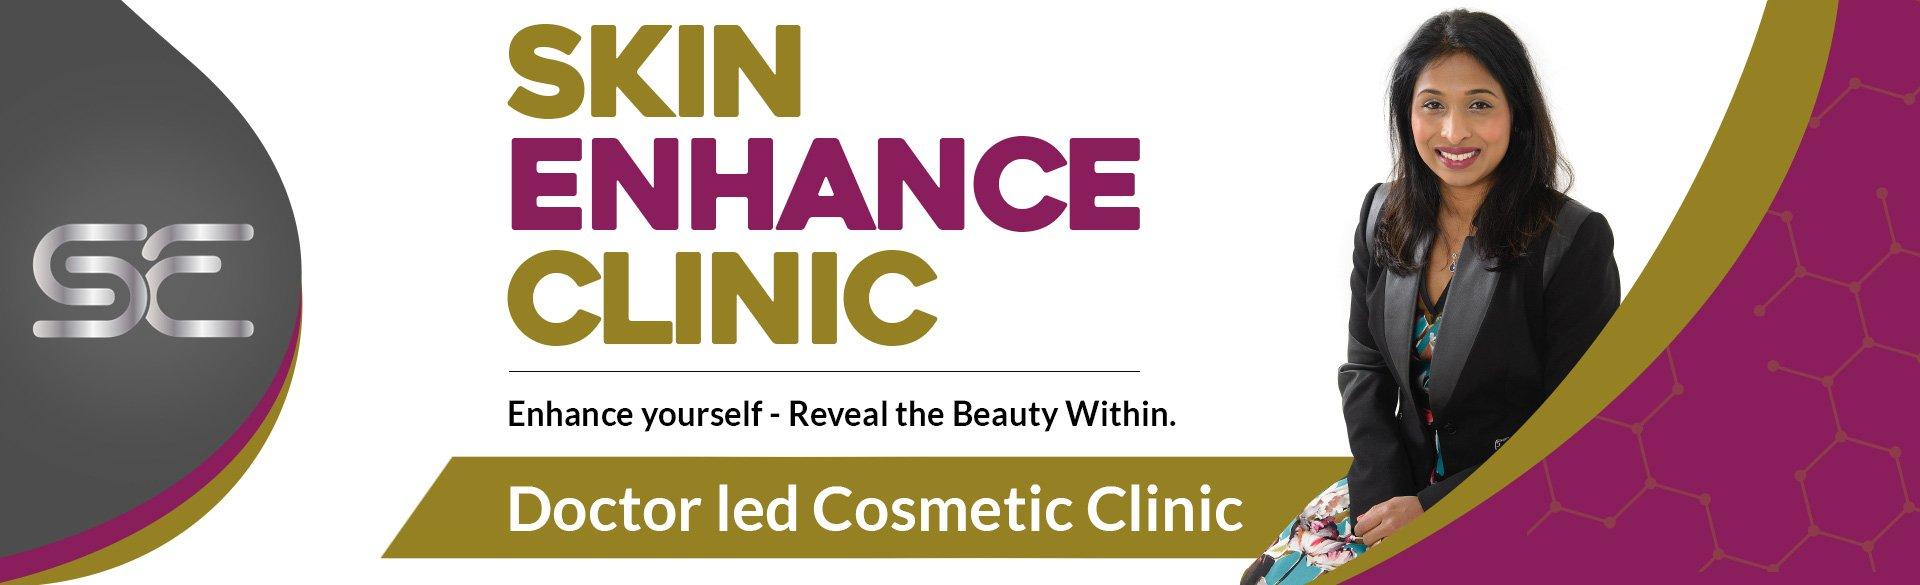 SKin Enhance is a Skin Clinic based in Billericay, Essex.